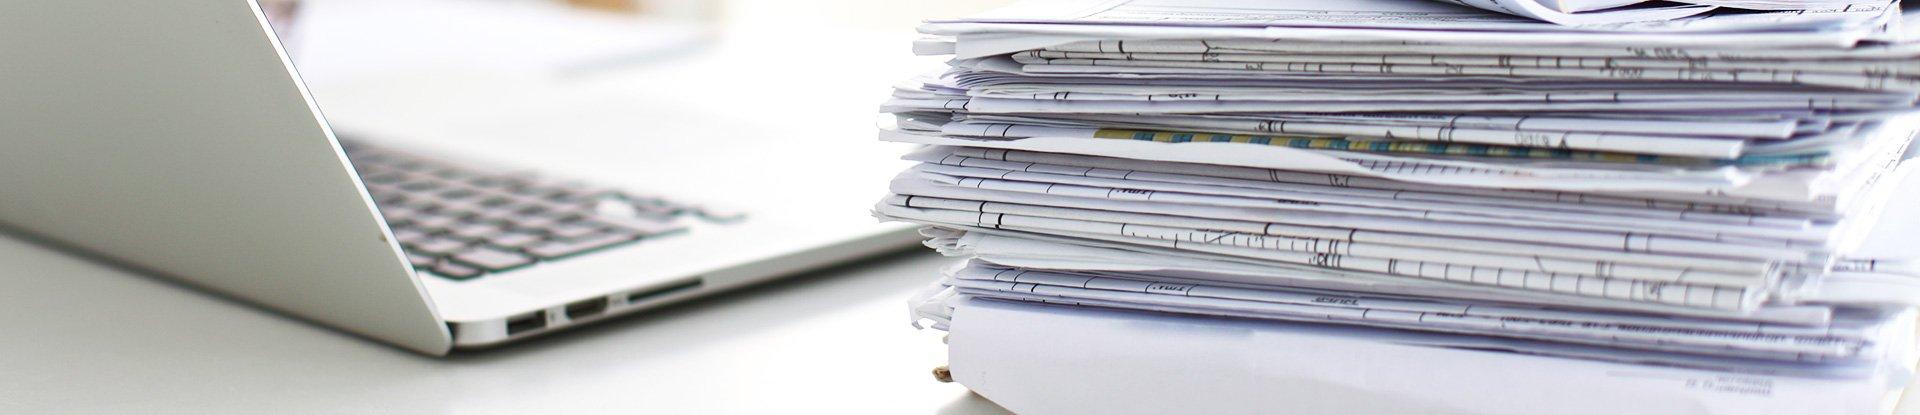 Document Management System (DMS) | WEBCON